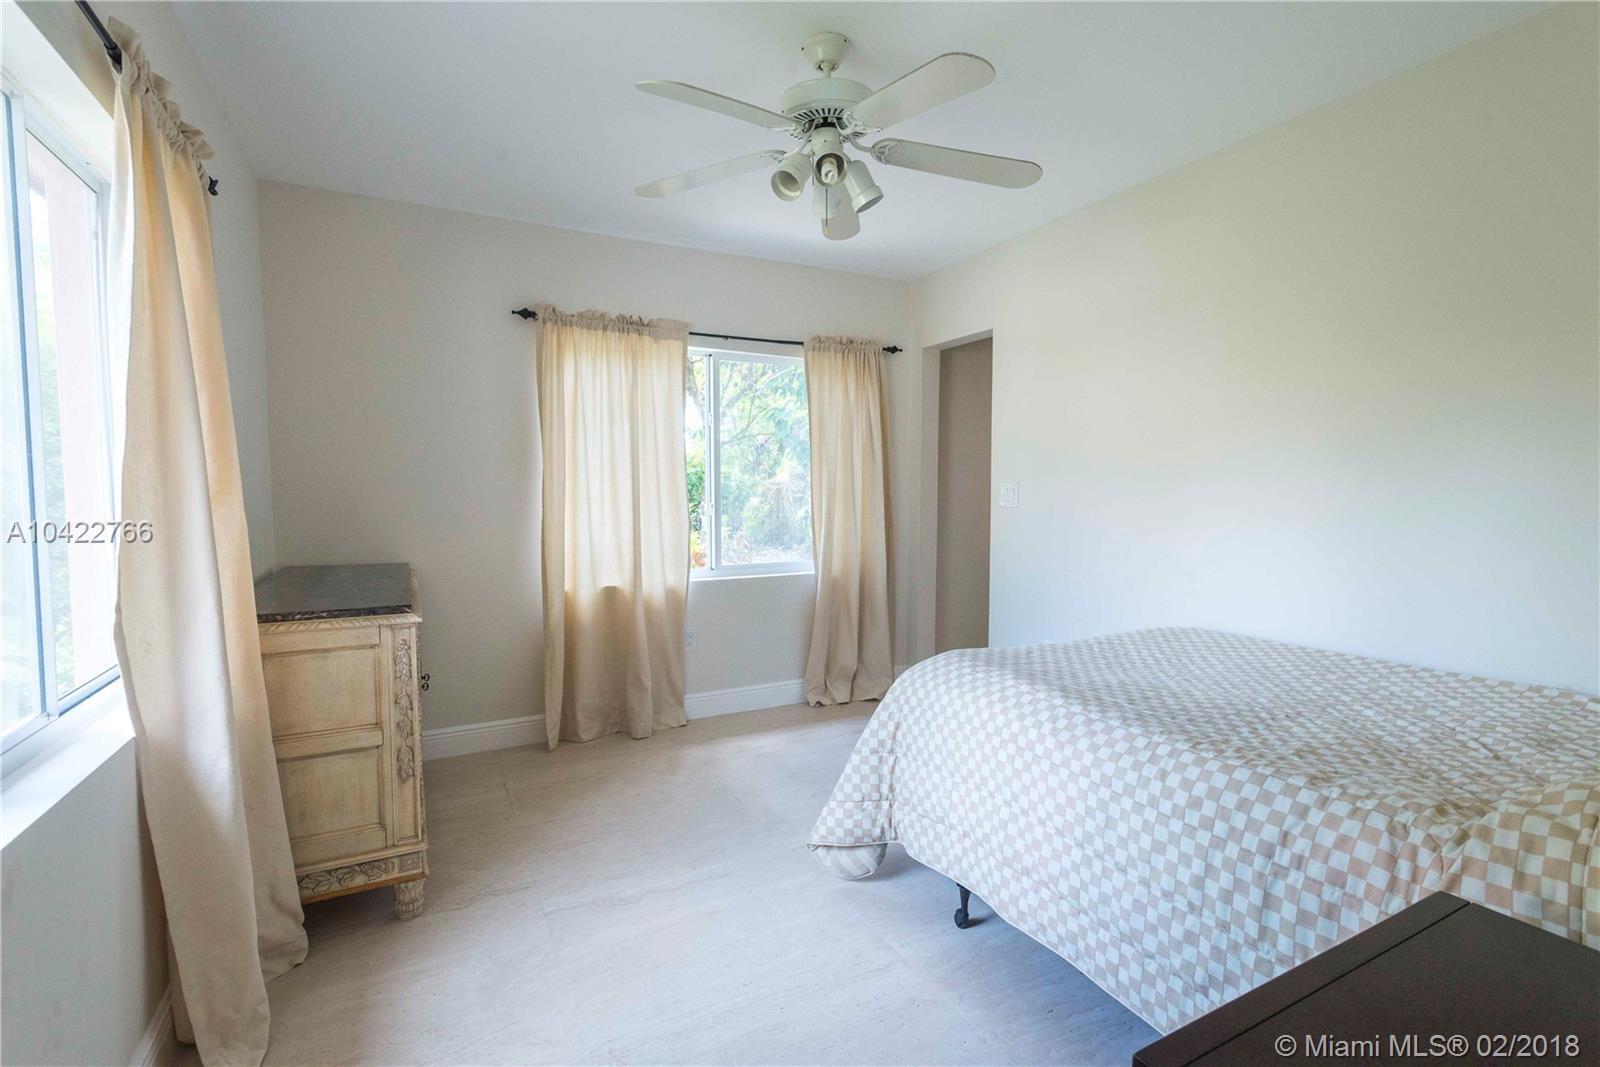 6810 Sw 62nd Ct, South Miami FL, 33143